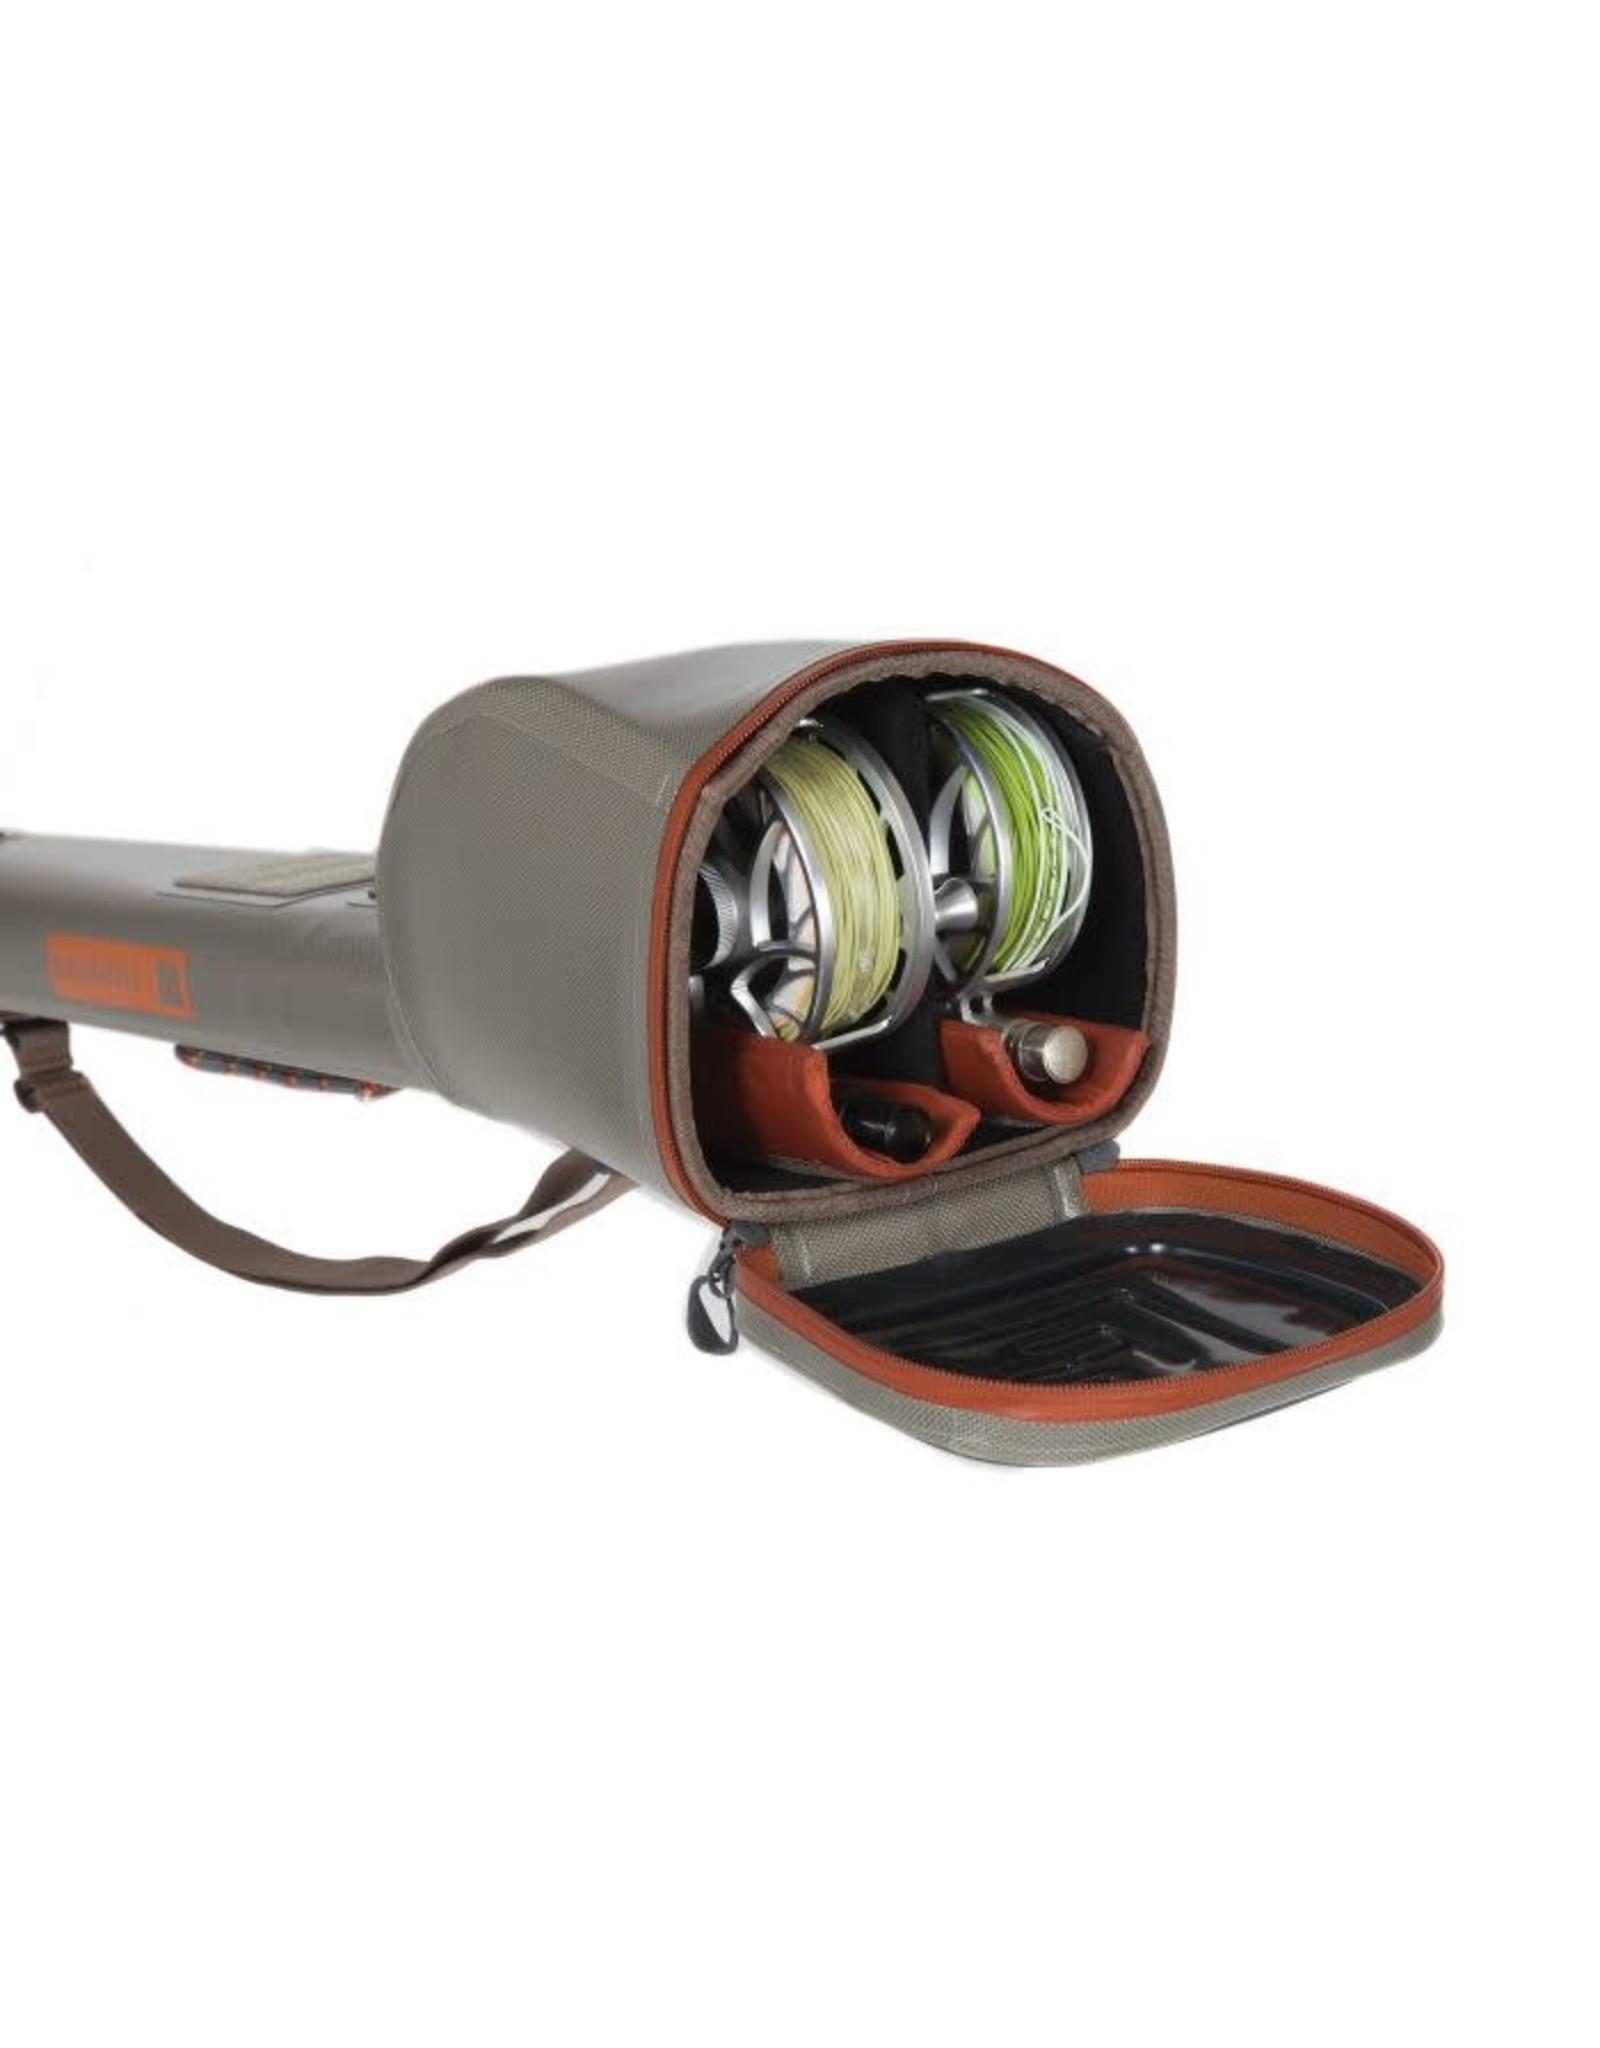 FISHPOND Fishpond Thunderhead Rod & Reel Case - 2 Piece Rods